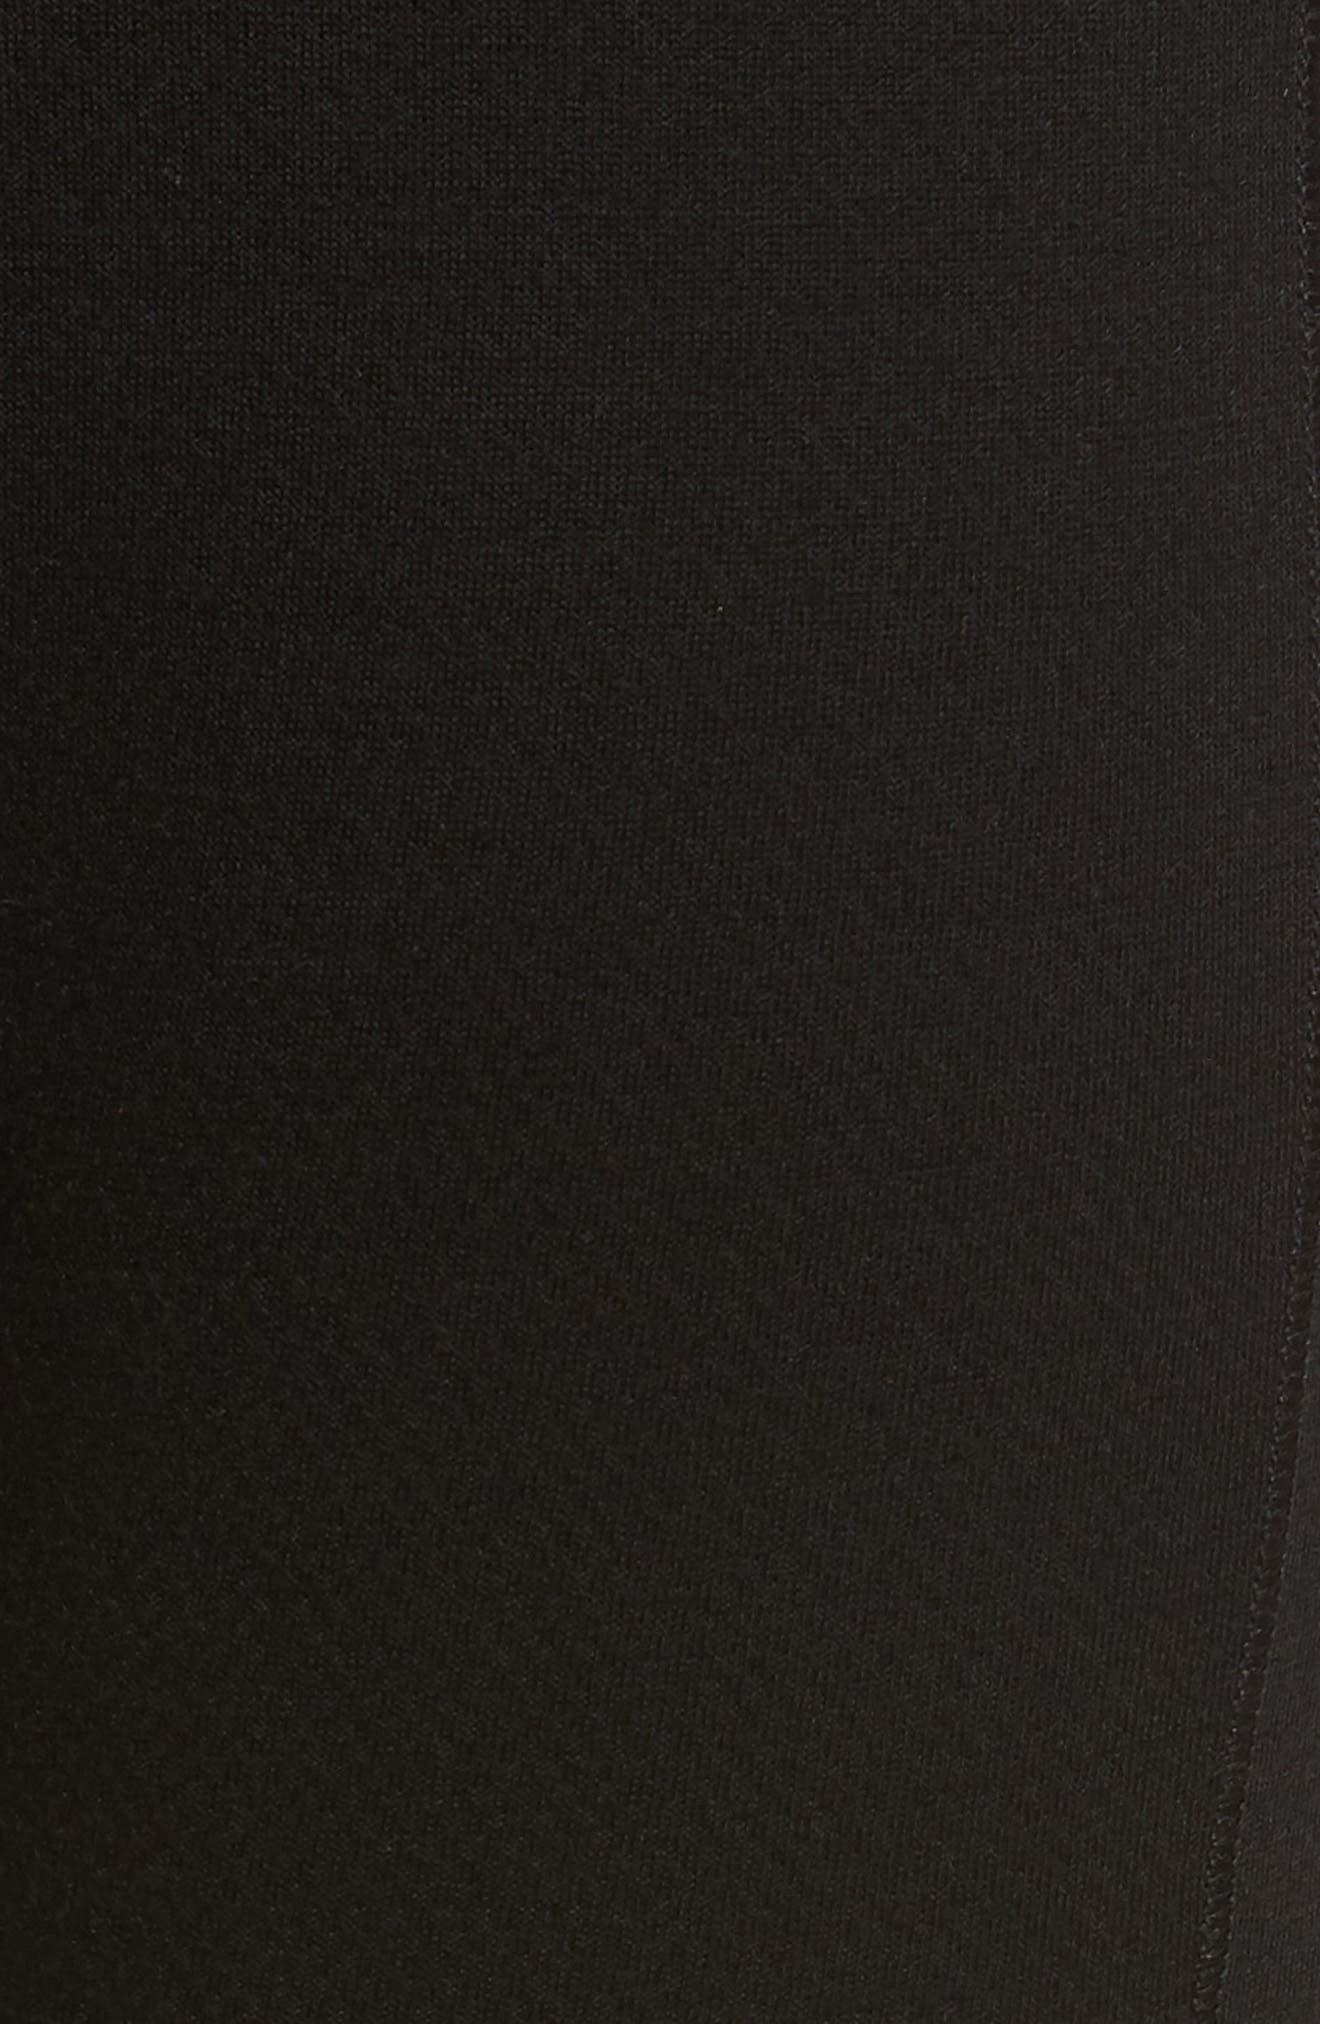 Lifa Merino Wool Blend Tights,                             Alternate thumbnail 5, color,                             Black